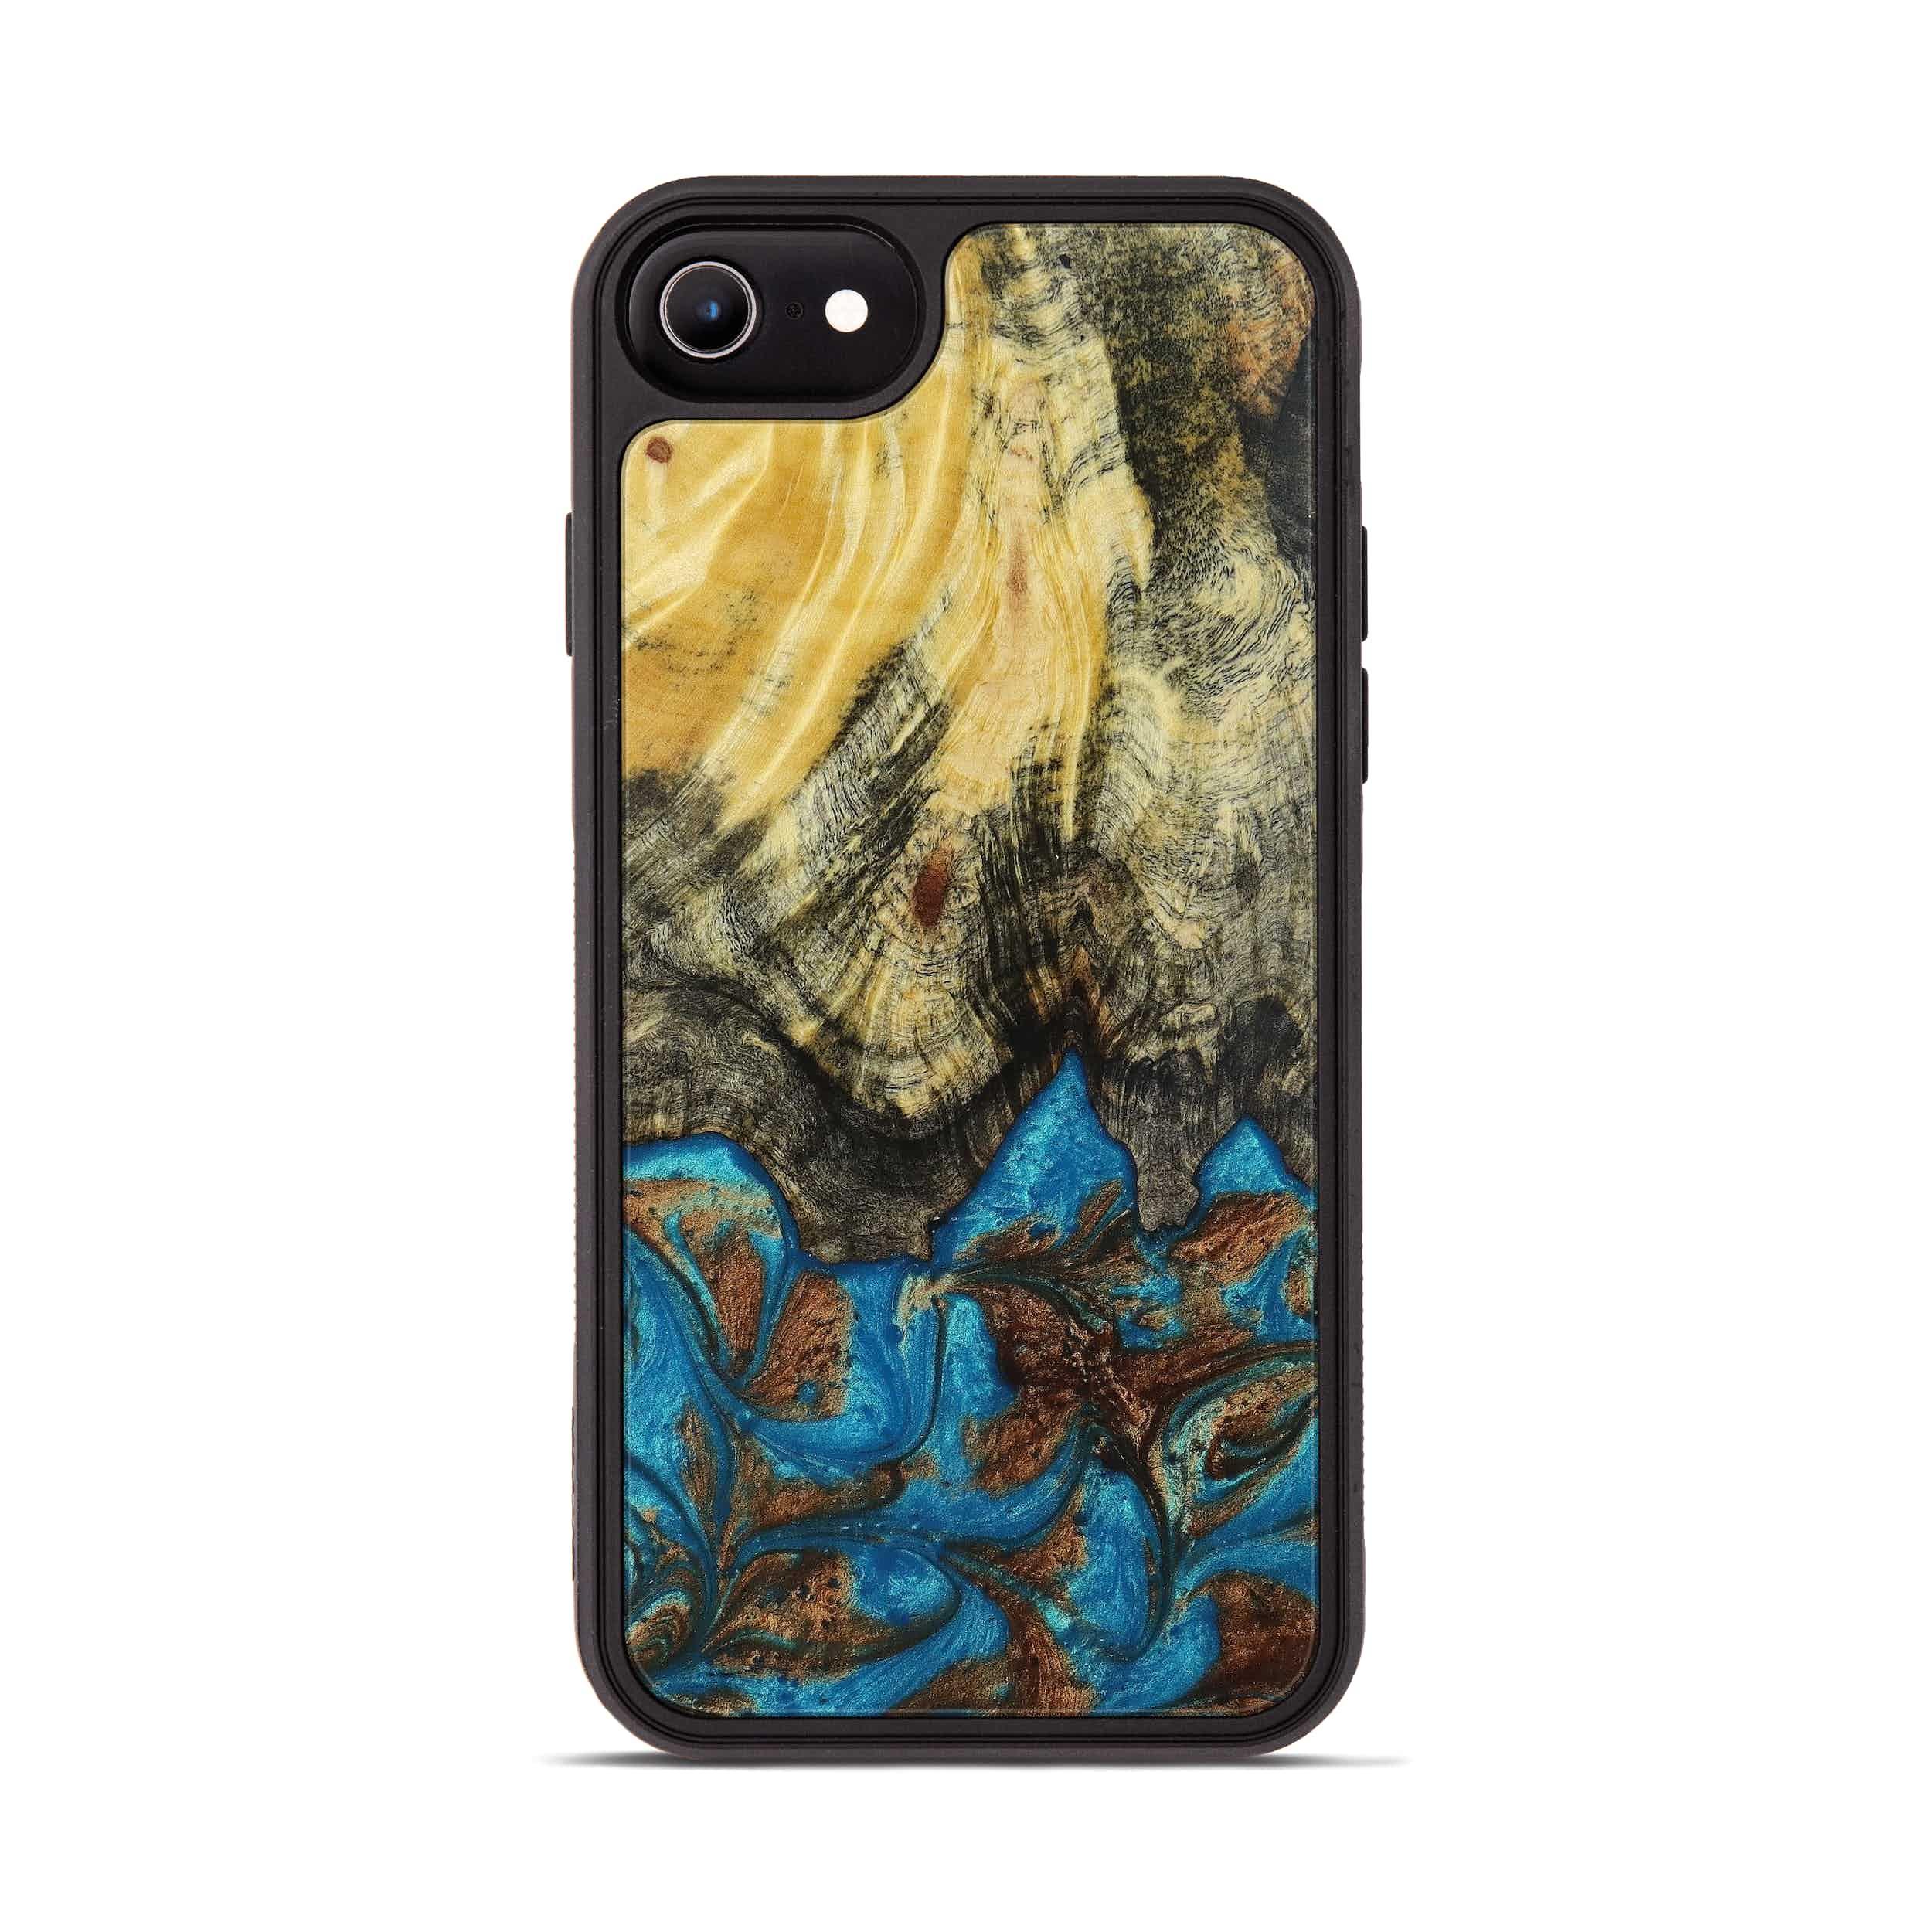 iPhone 6s Wood+Resin Phone Case - Kassie (Teal & Gold, 397227)